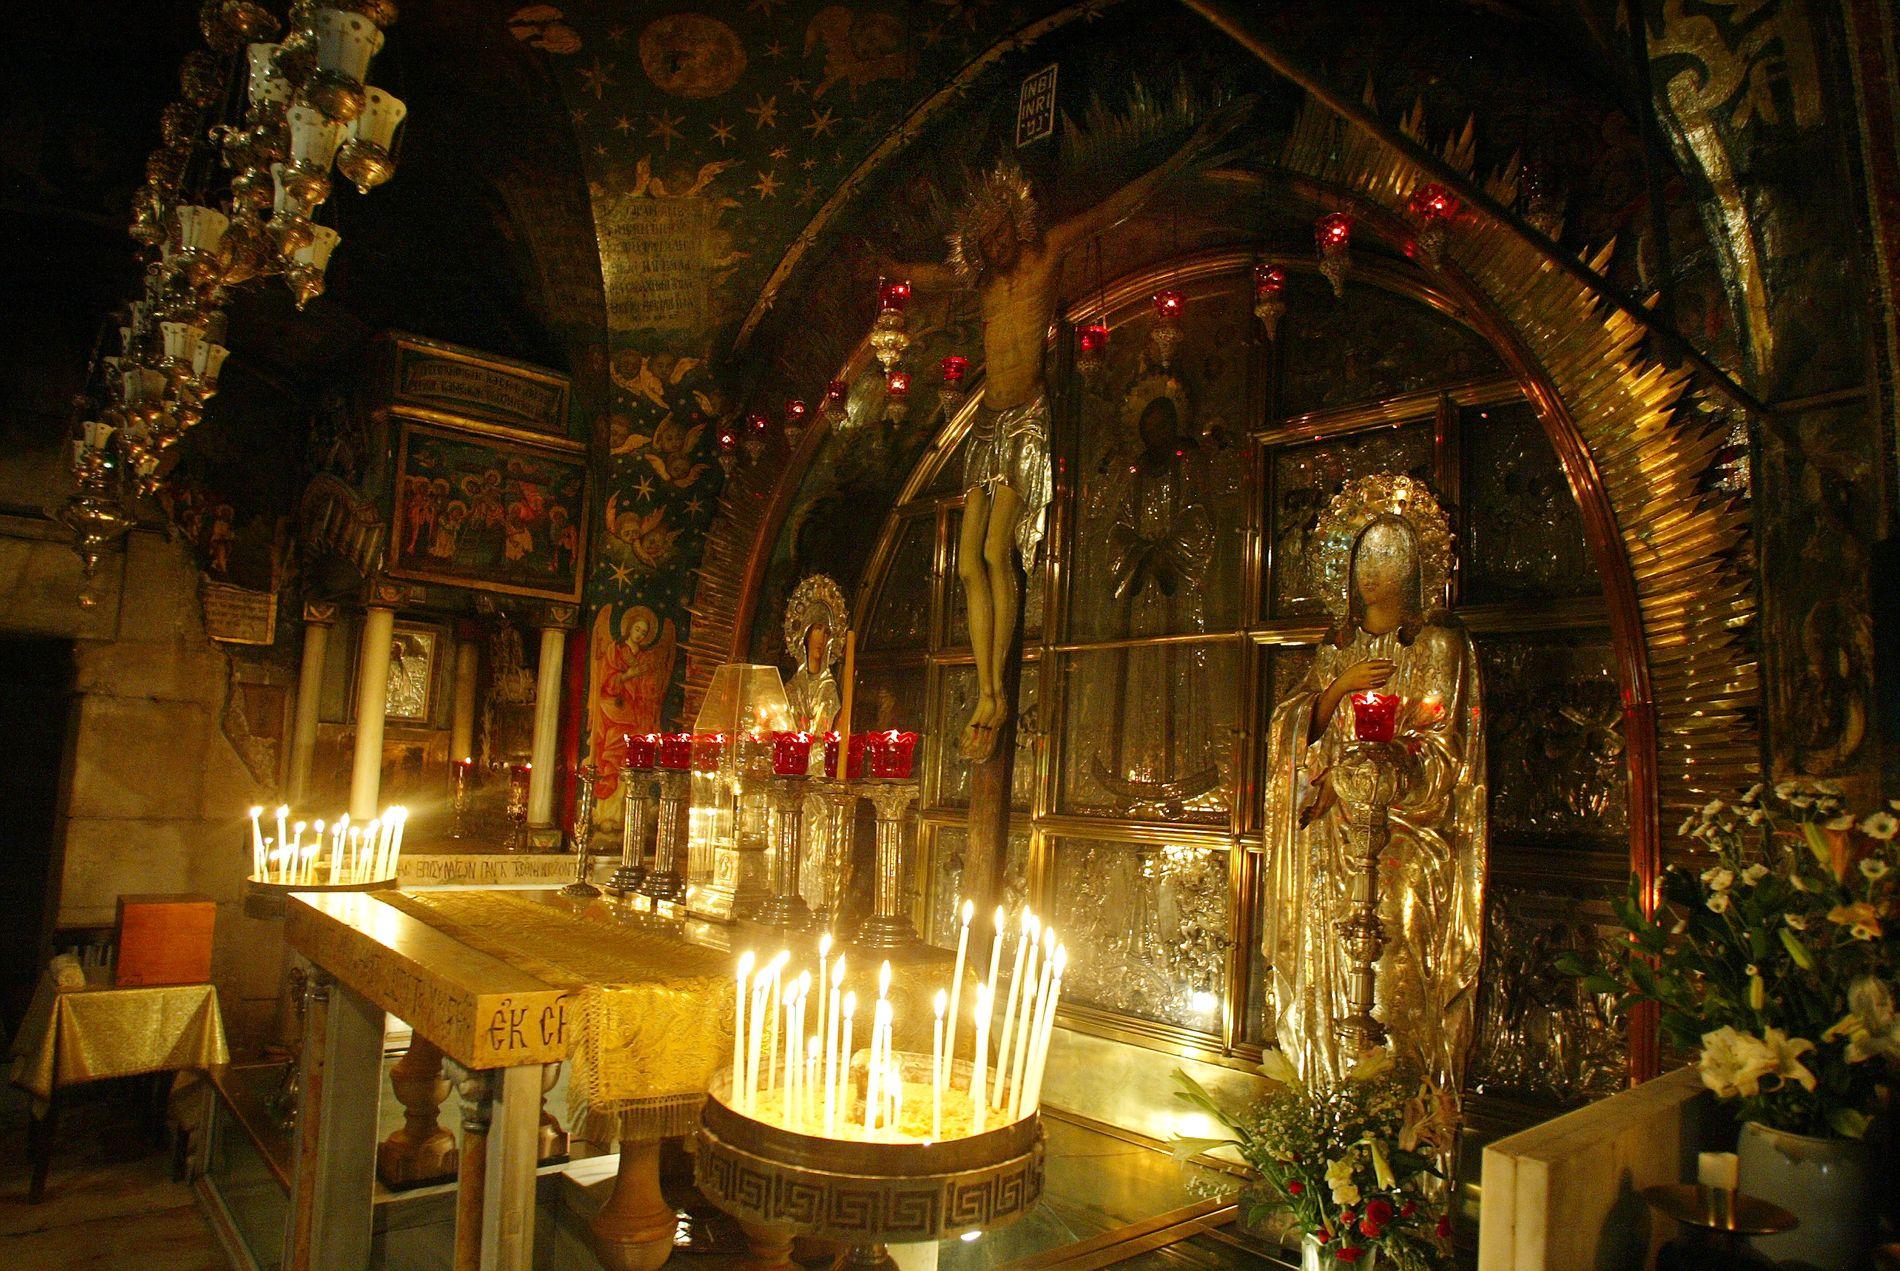 JERUSALEM: Den hellige gravs kirke i Jerusalem. Foto: Gorm Kallestad / NTB scanpix